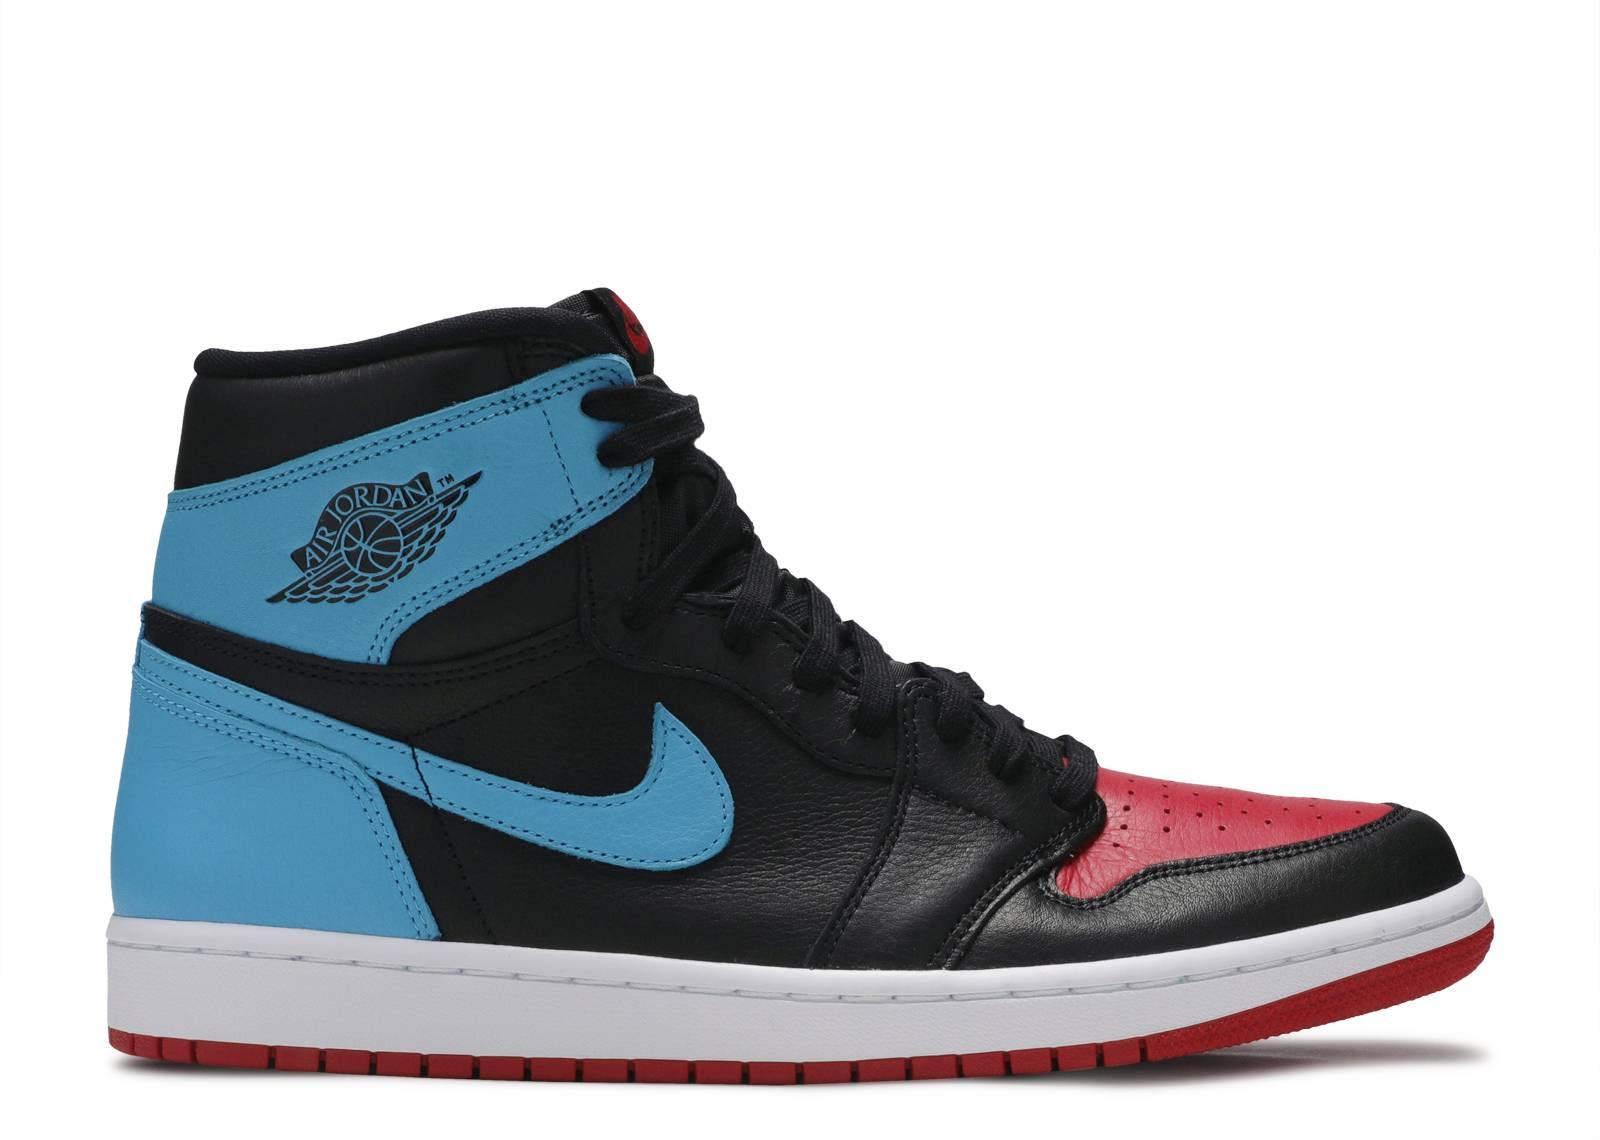 Abreviatura Significado Cambiable  Wmns Air Jordan 1 High OG 'UNC To Chicago' - Air Jordan - CD0461 046 -  black/dark powder blue/gym red | Flight Club